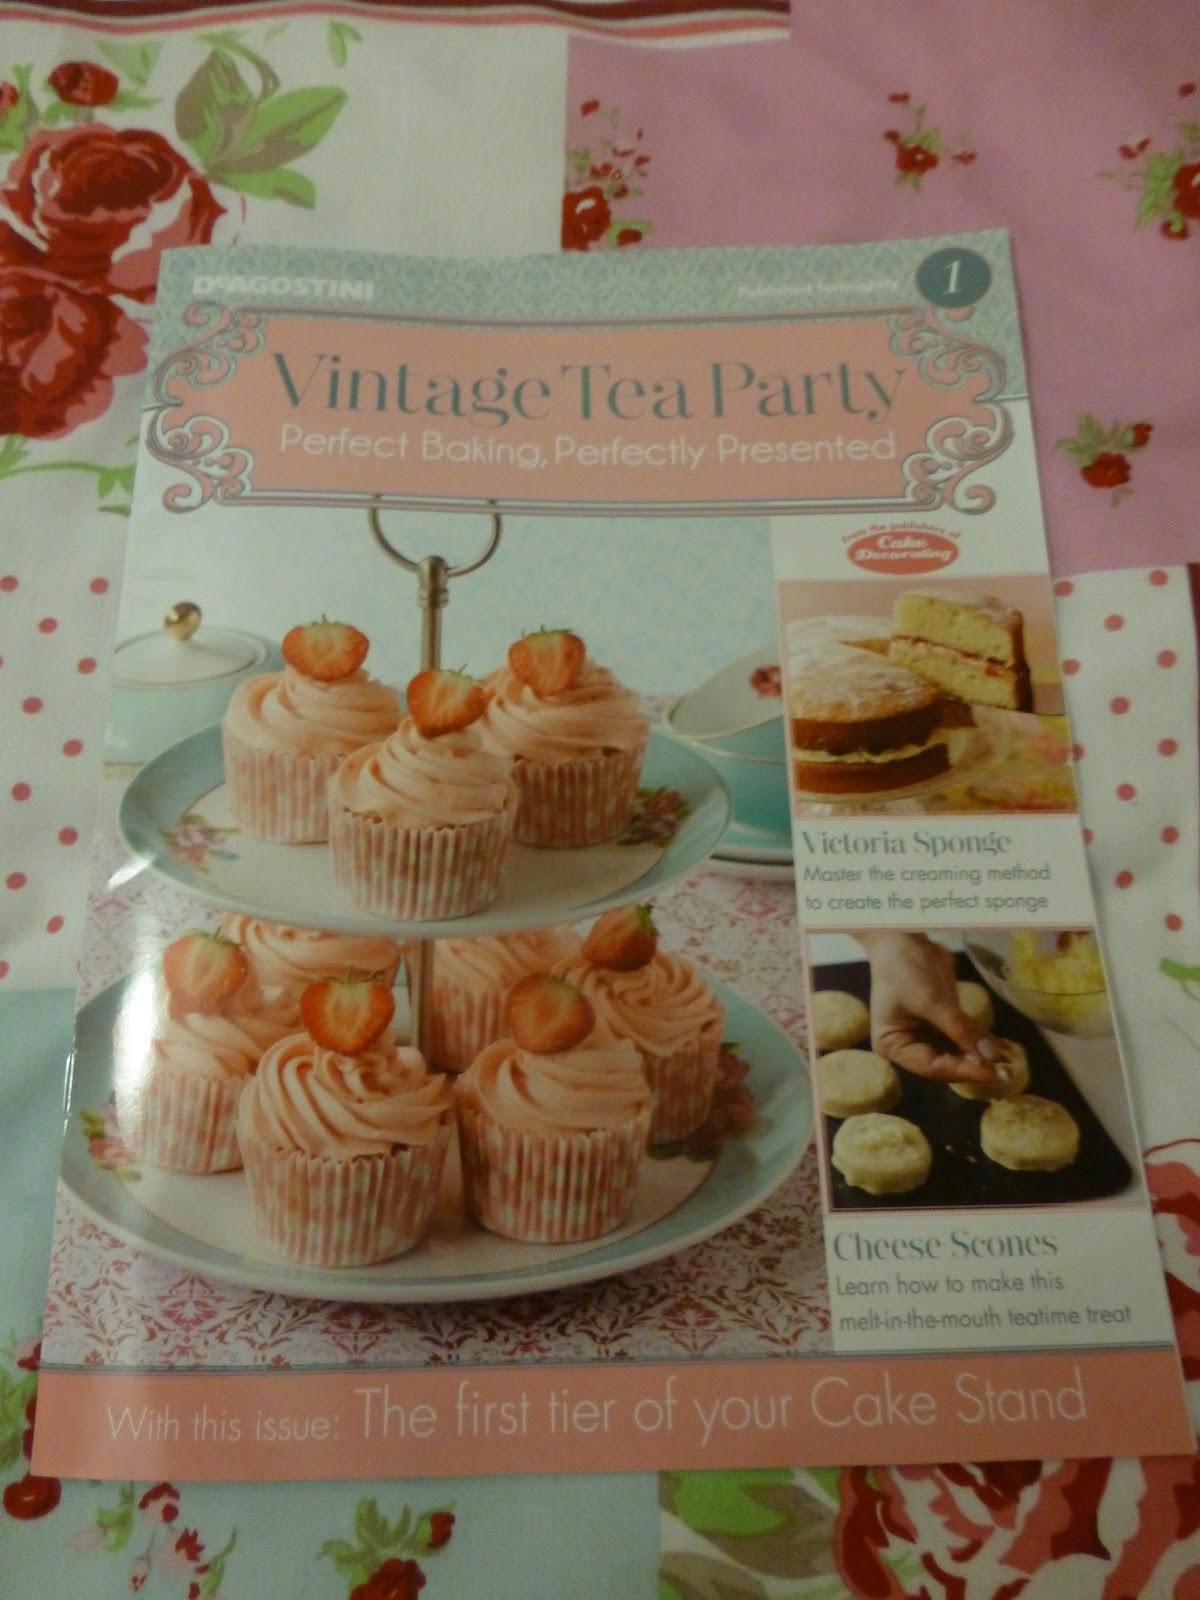 Impatience Is A Virtue Lifestyle Beauty Blog Vintage Tea Party